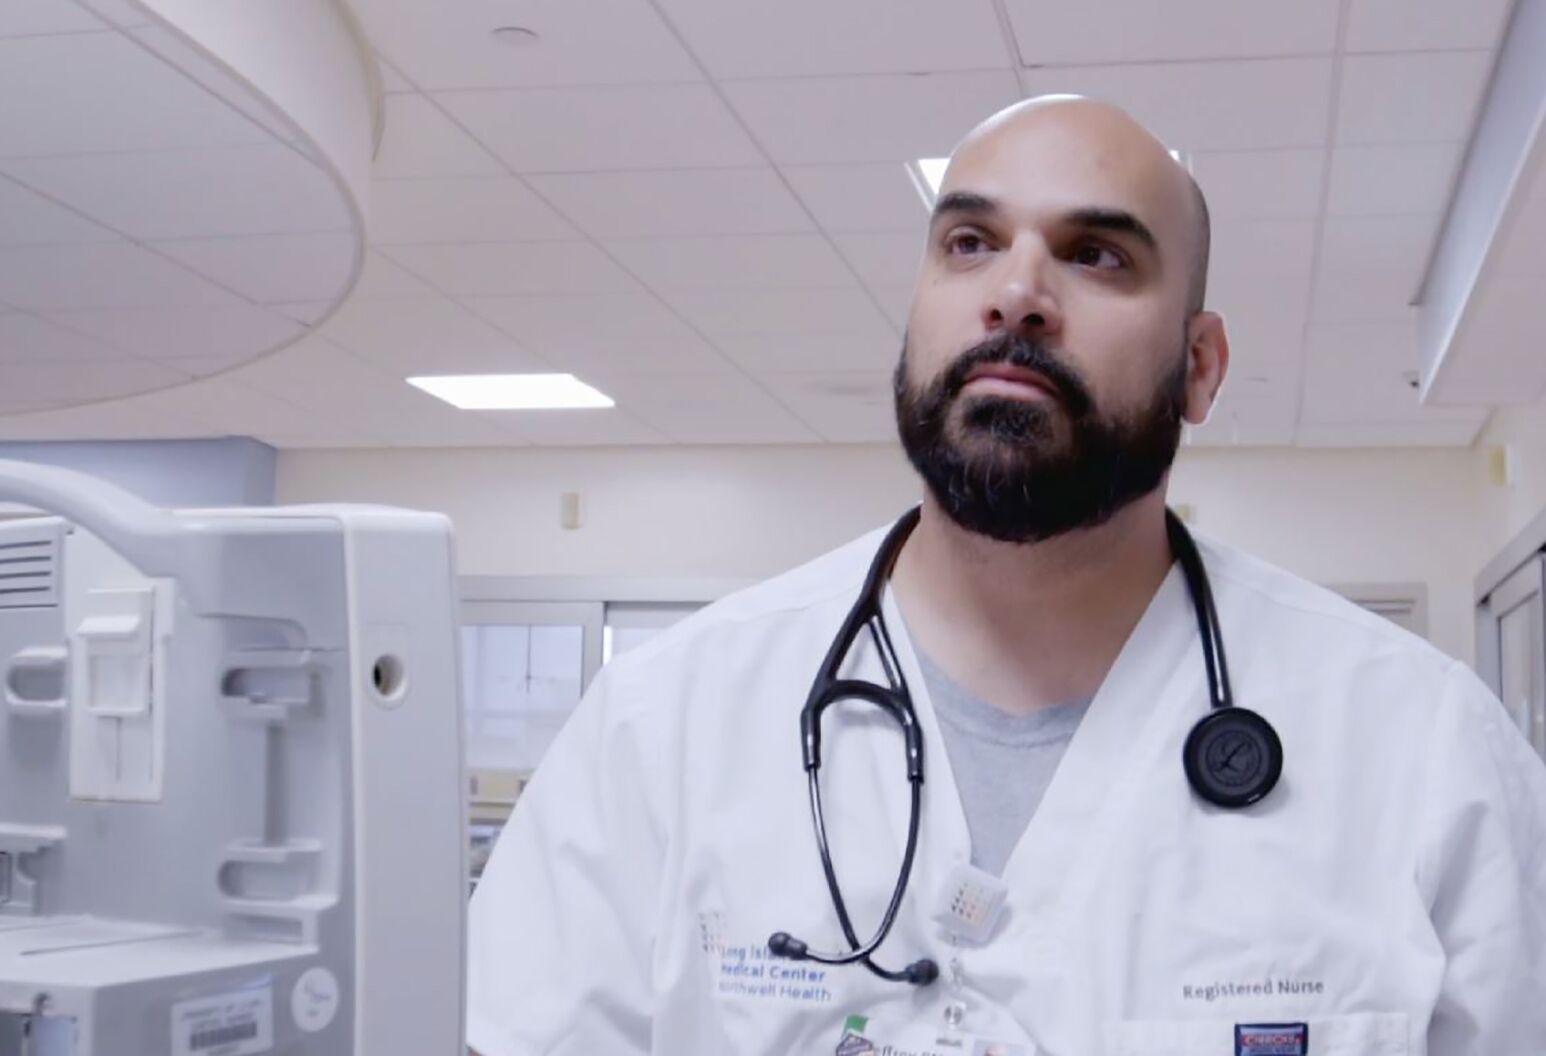 Nurse of the Year: Jeffrey Rosa